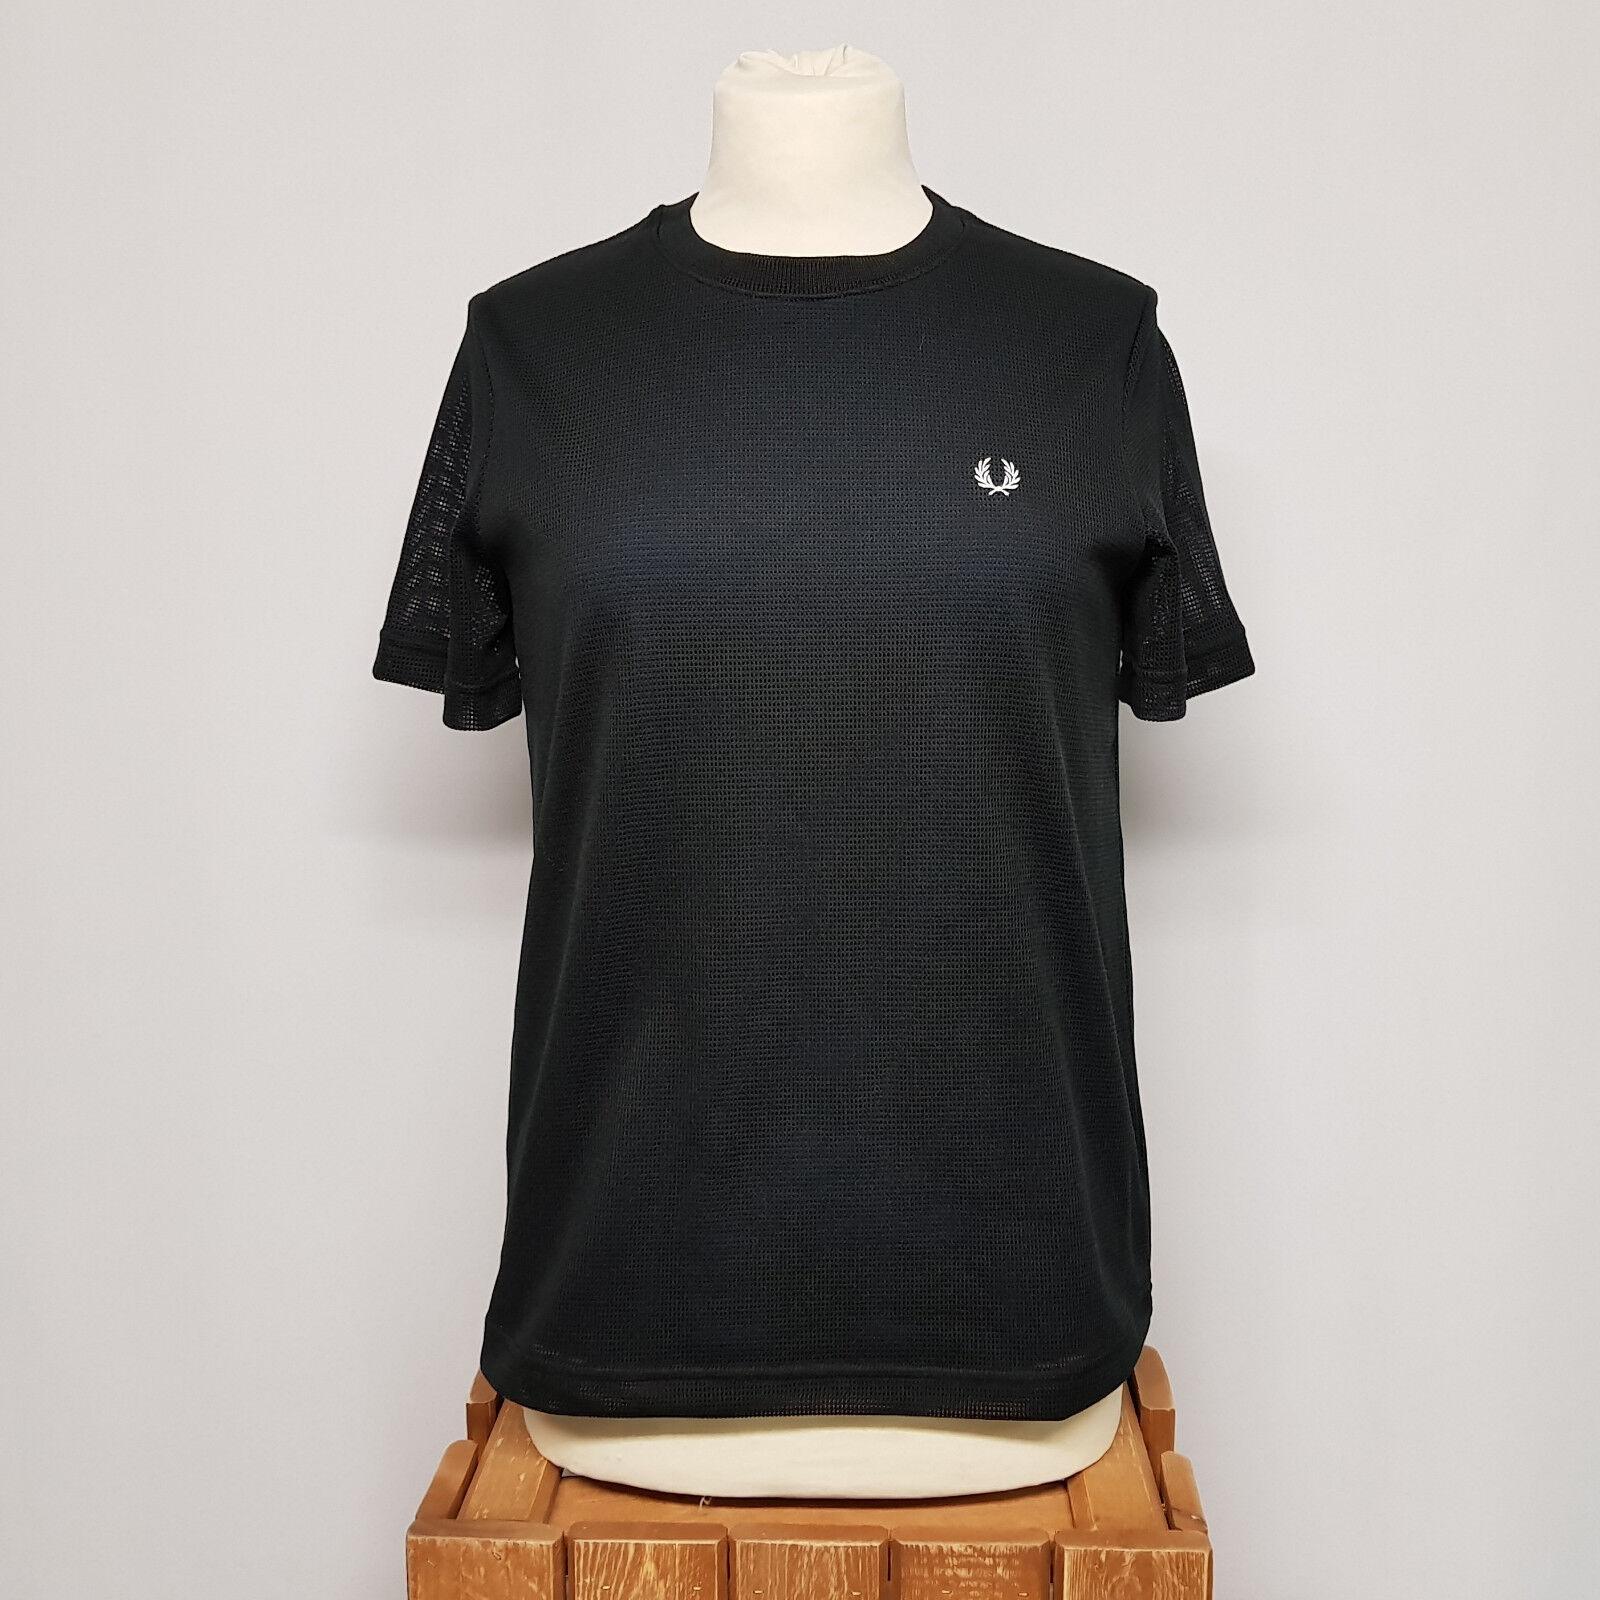 Frot Perry Girls Mesh Overlay T-Shirt Medieval Blau G2144-126 Damen Shirt blau